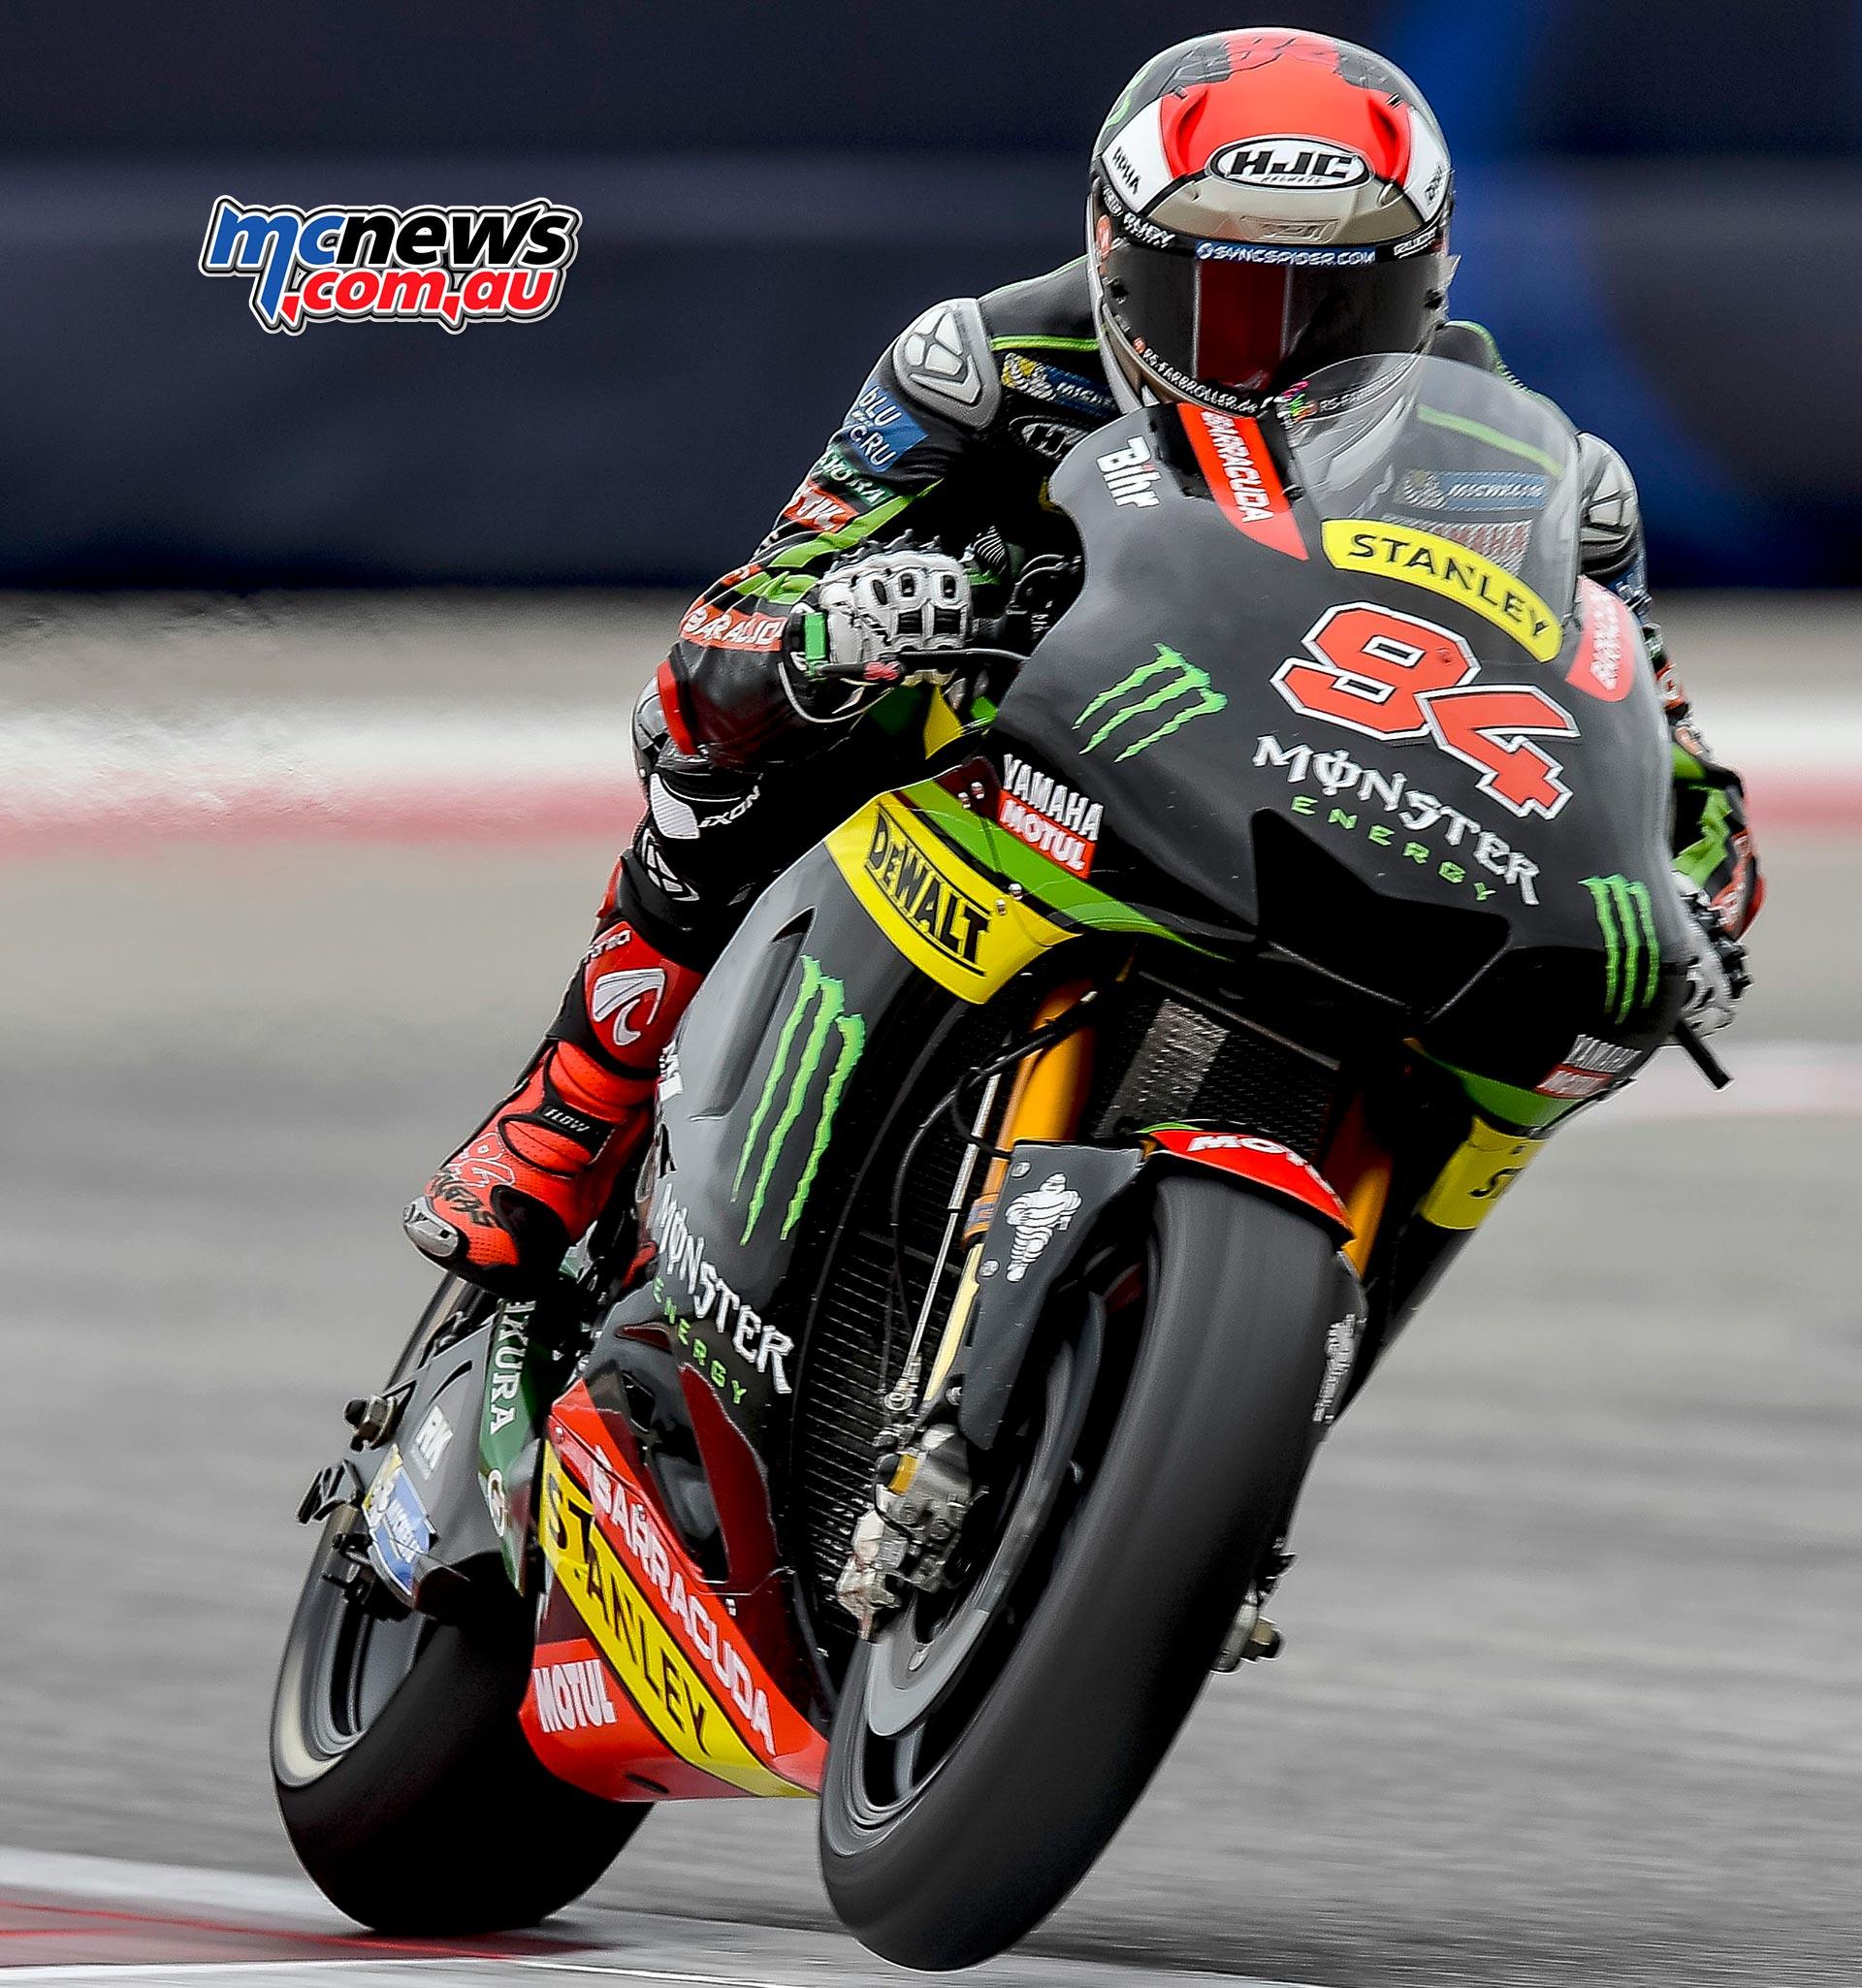 Jerez awaits the gladiators of MotoGP | MCNews.com.au